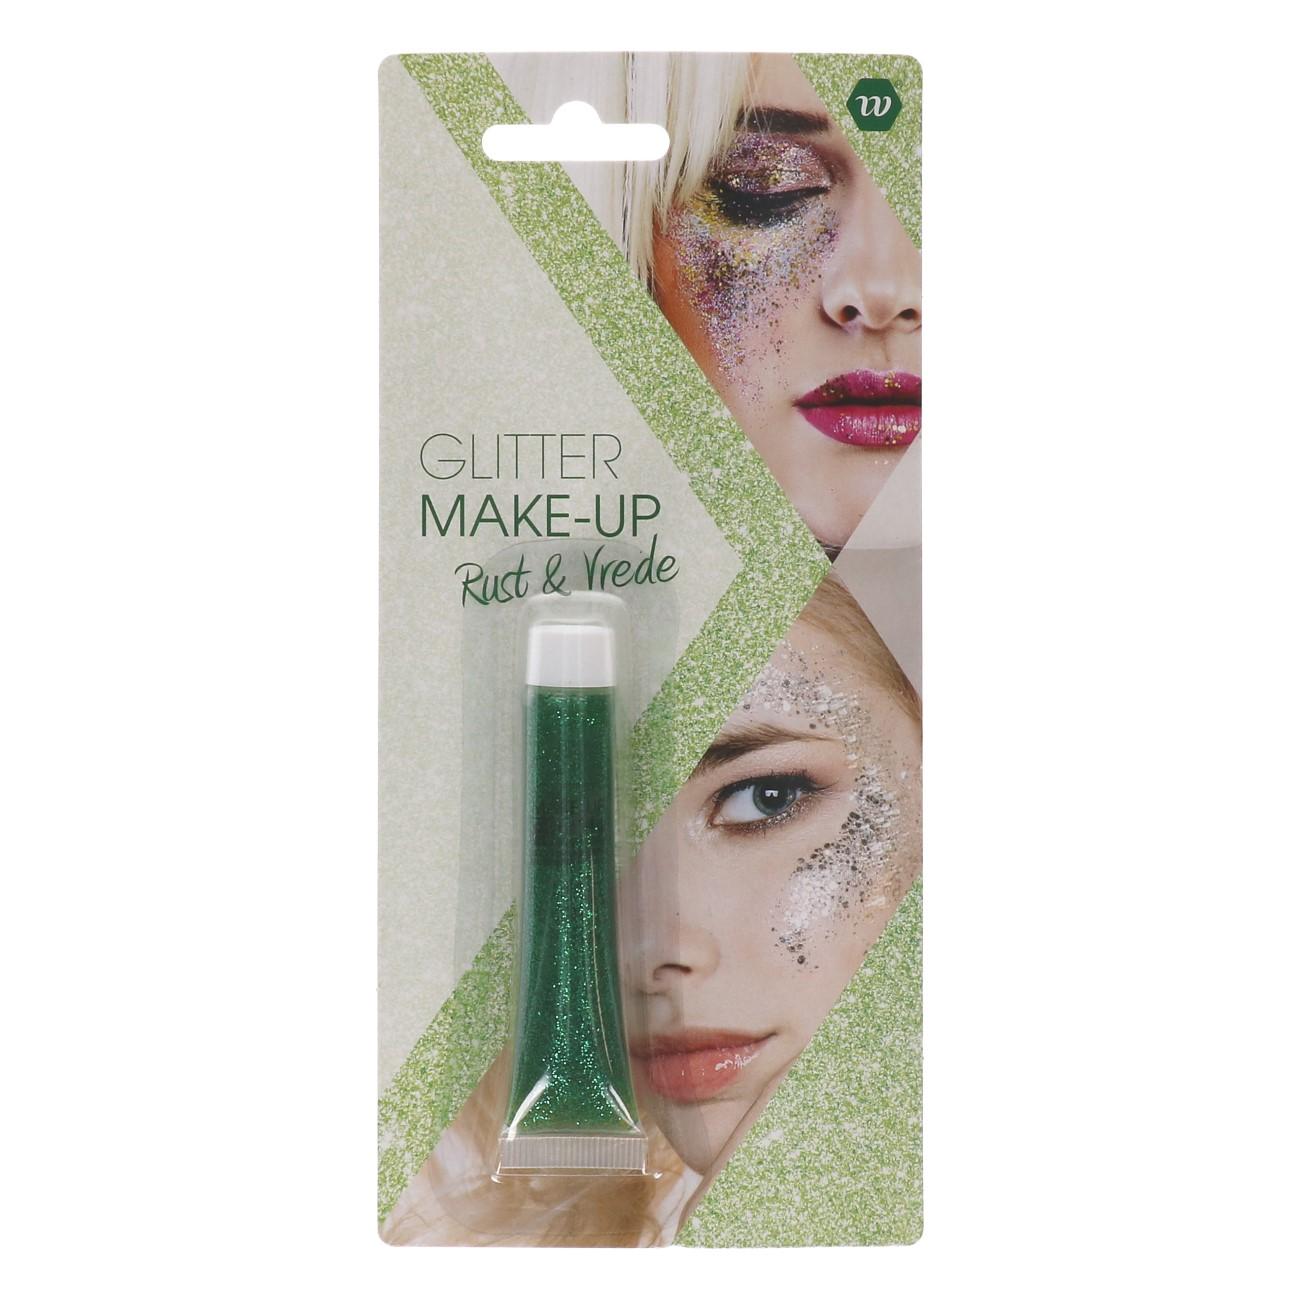 Glitter Make-up Rust & Vrede (Groen) 14gr